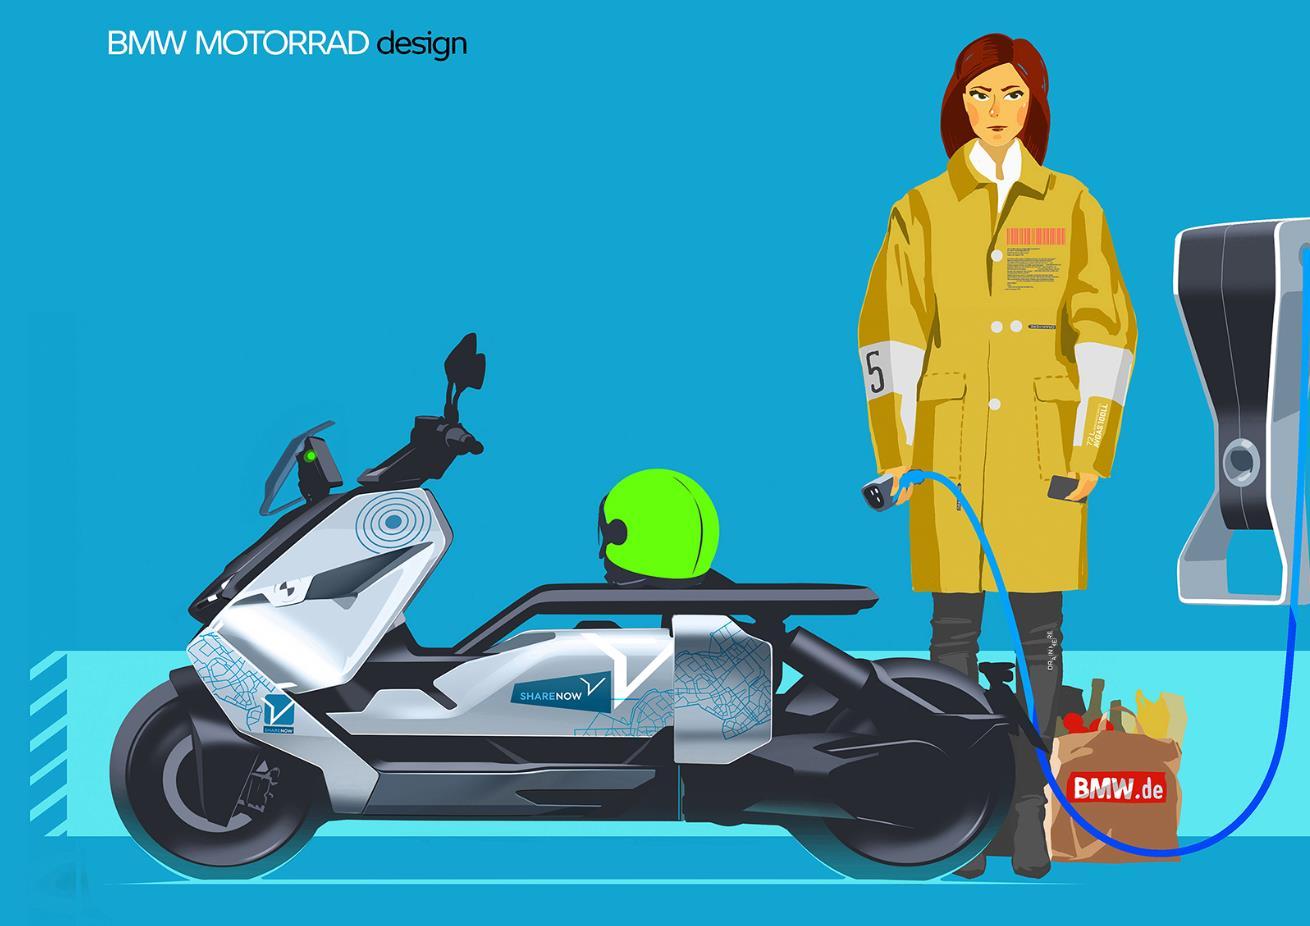 0BMW Motorrad Definition CE 04概念车7.jpg